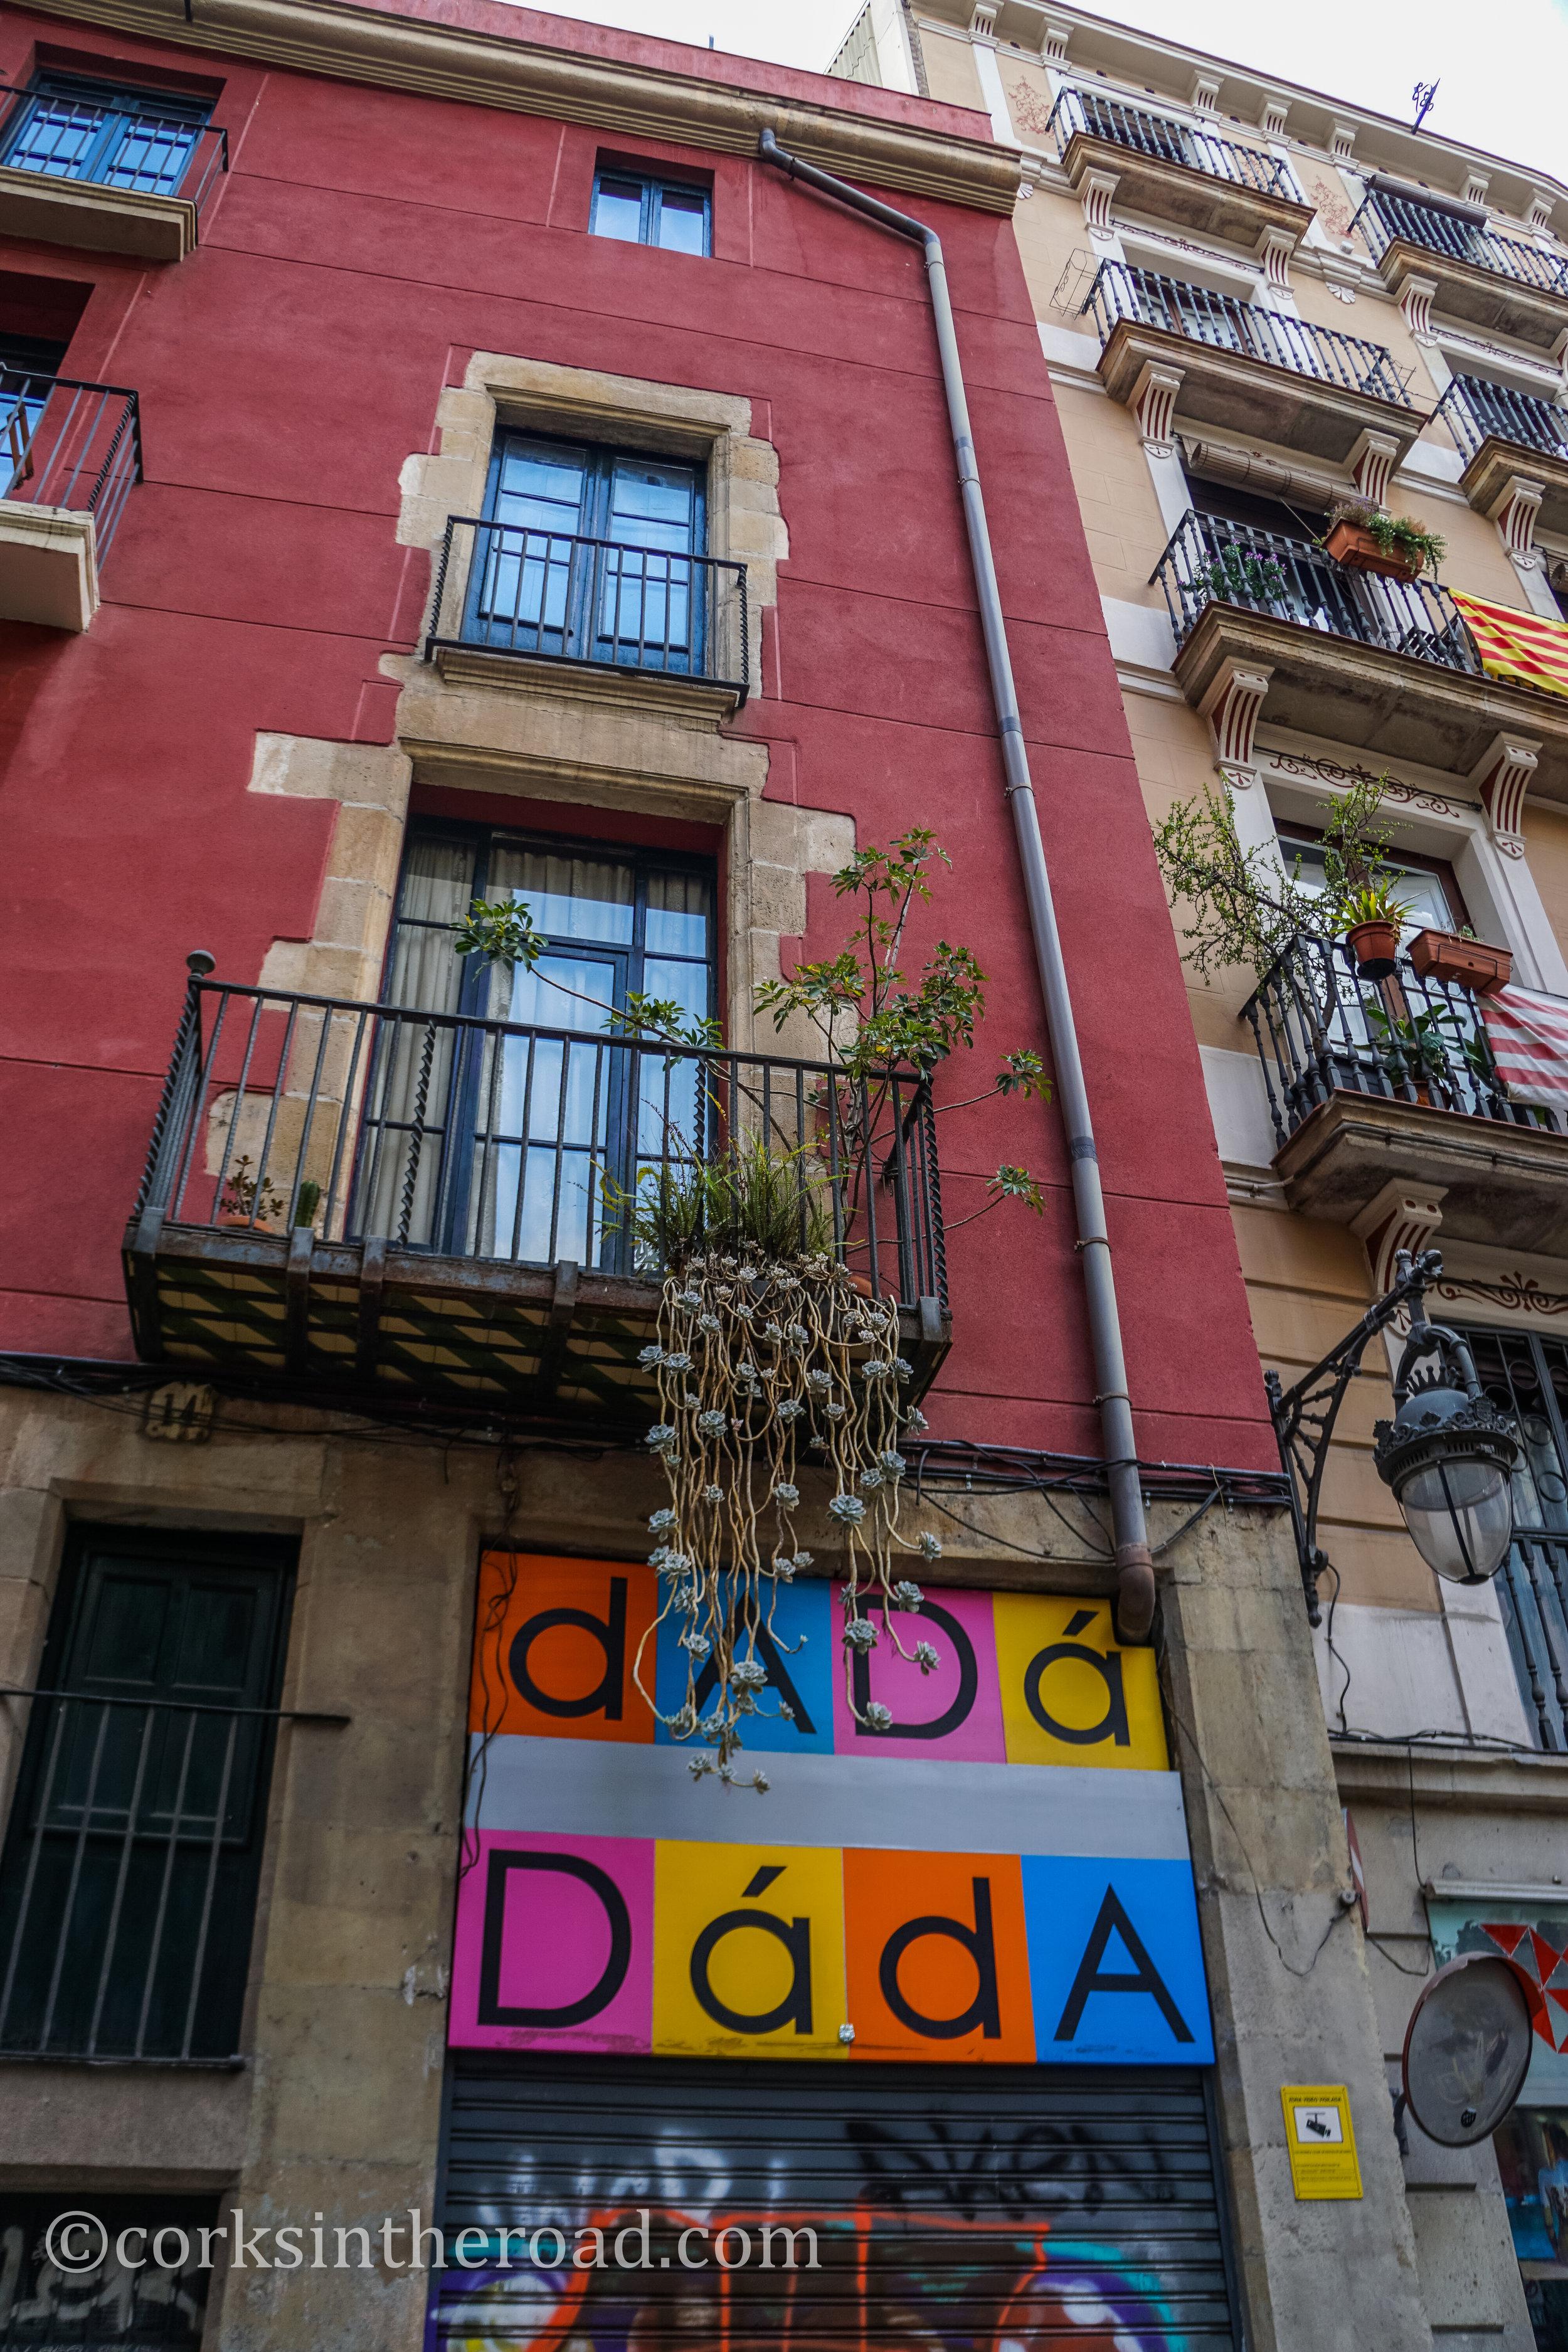 20160805Architecture, Barcelona, Corksintheroad-18.jpg